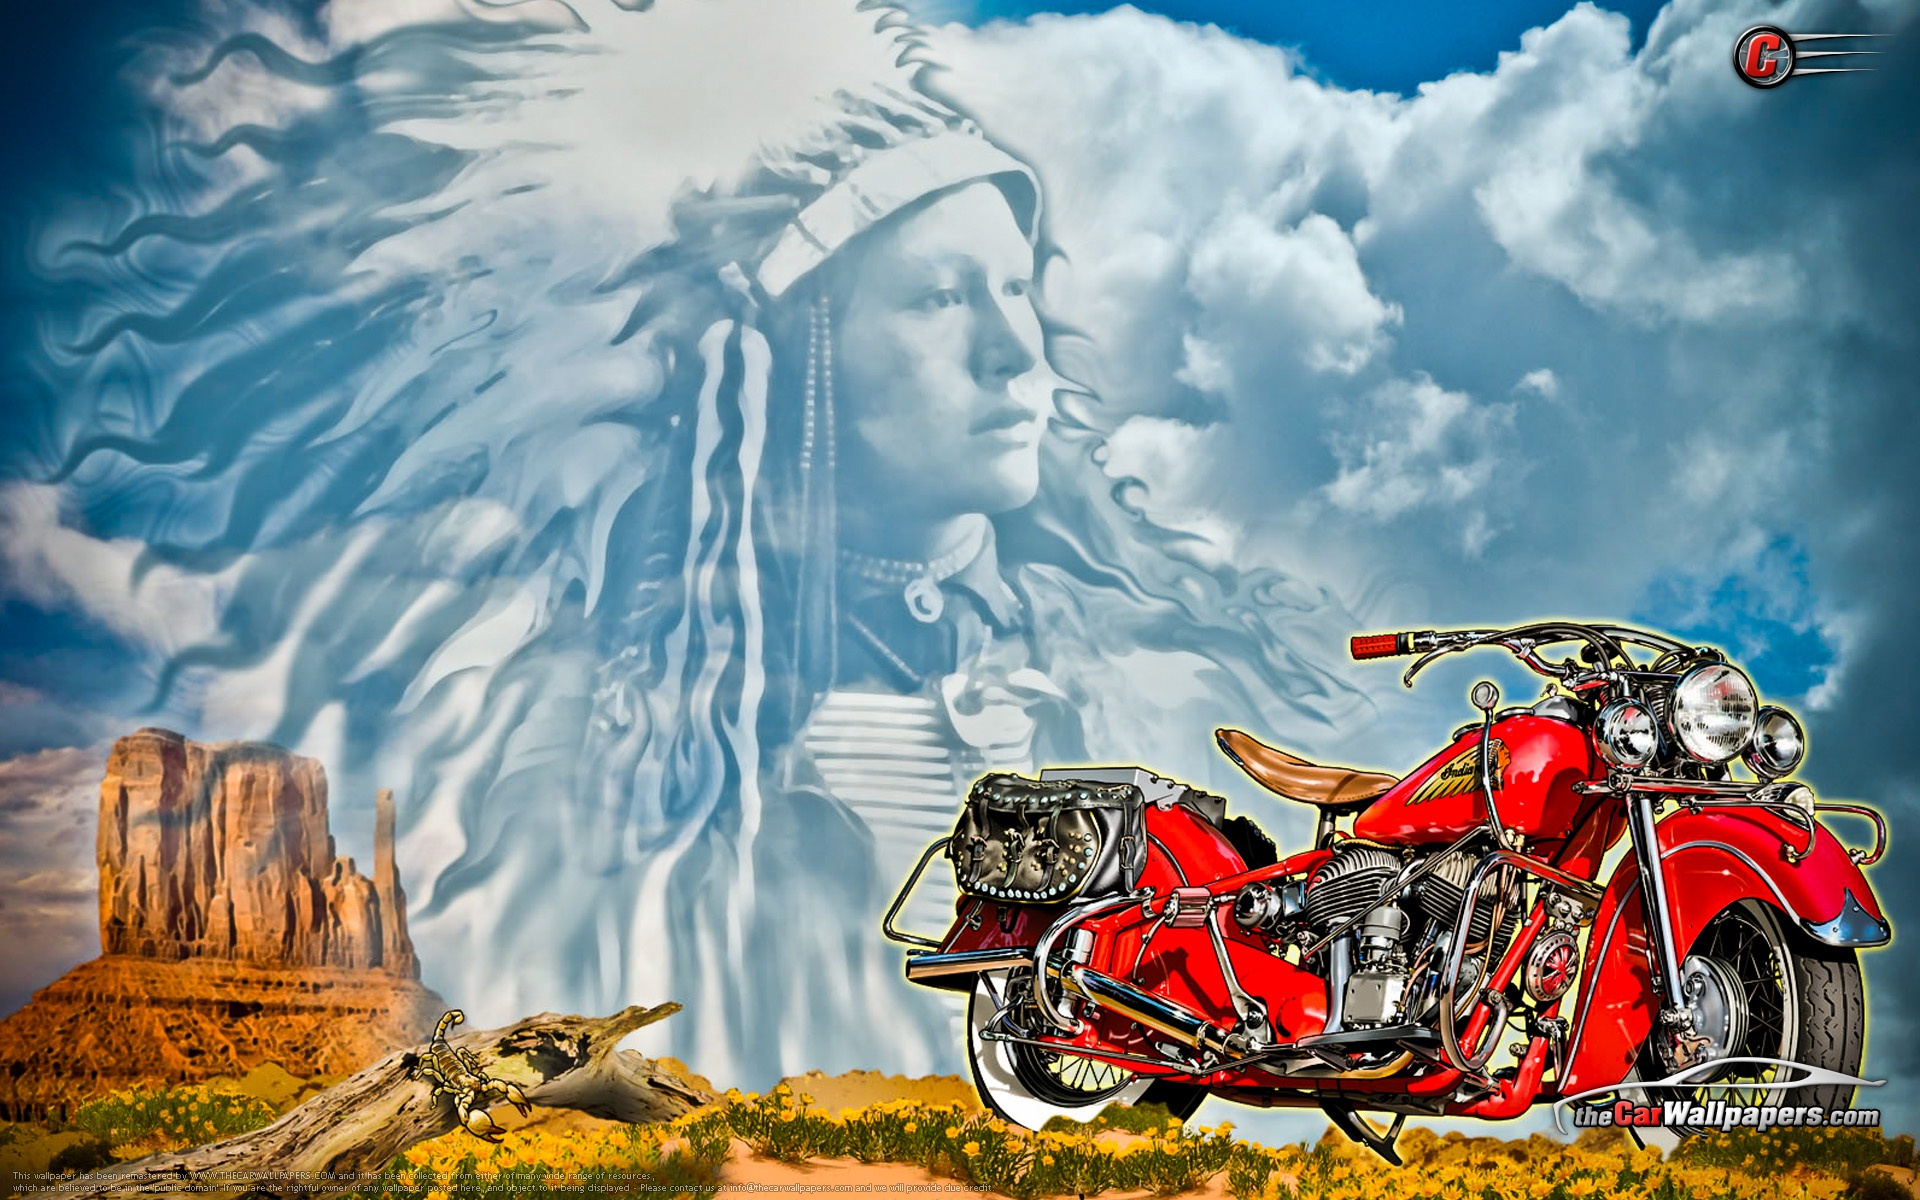 48 Motorcycle Art Wallpaper On Wallpapersafari